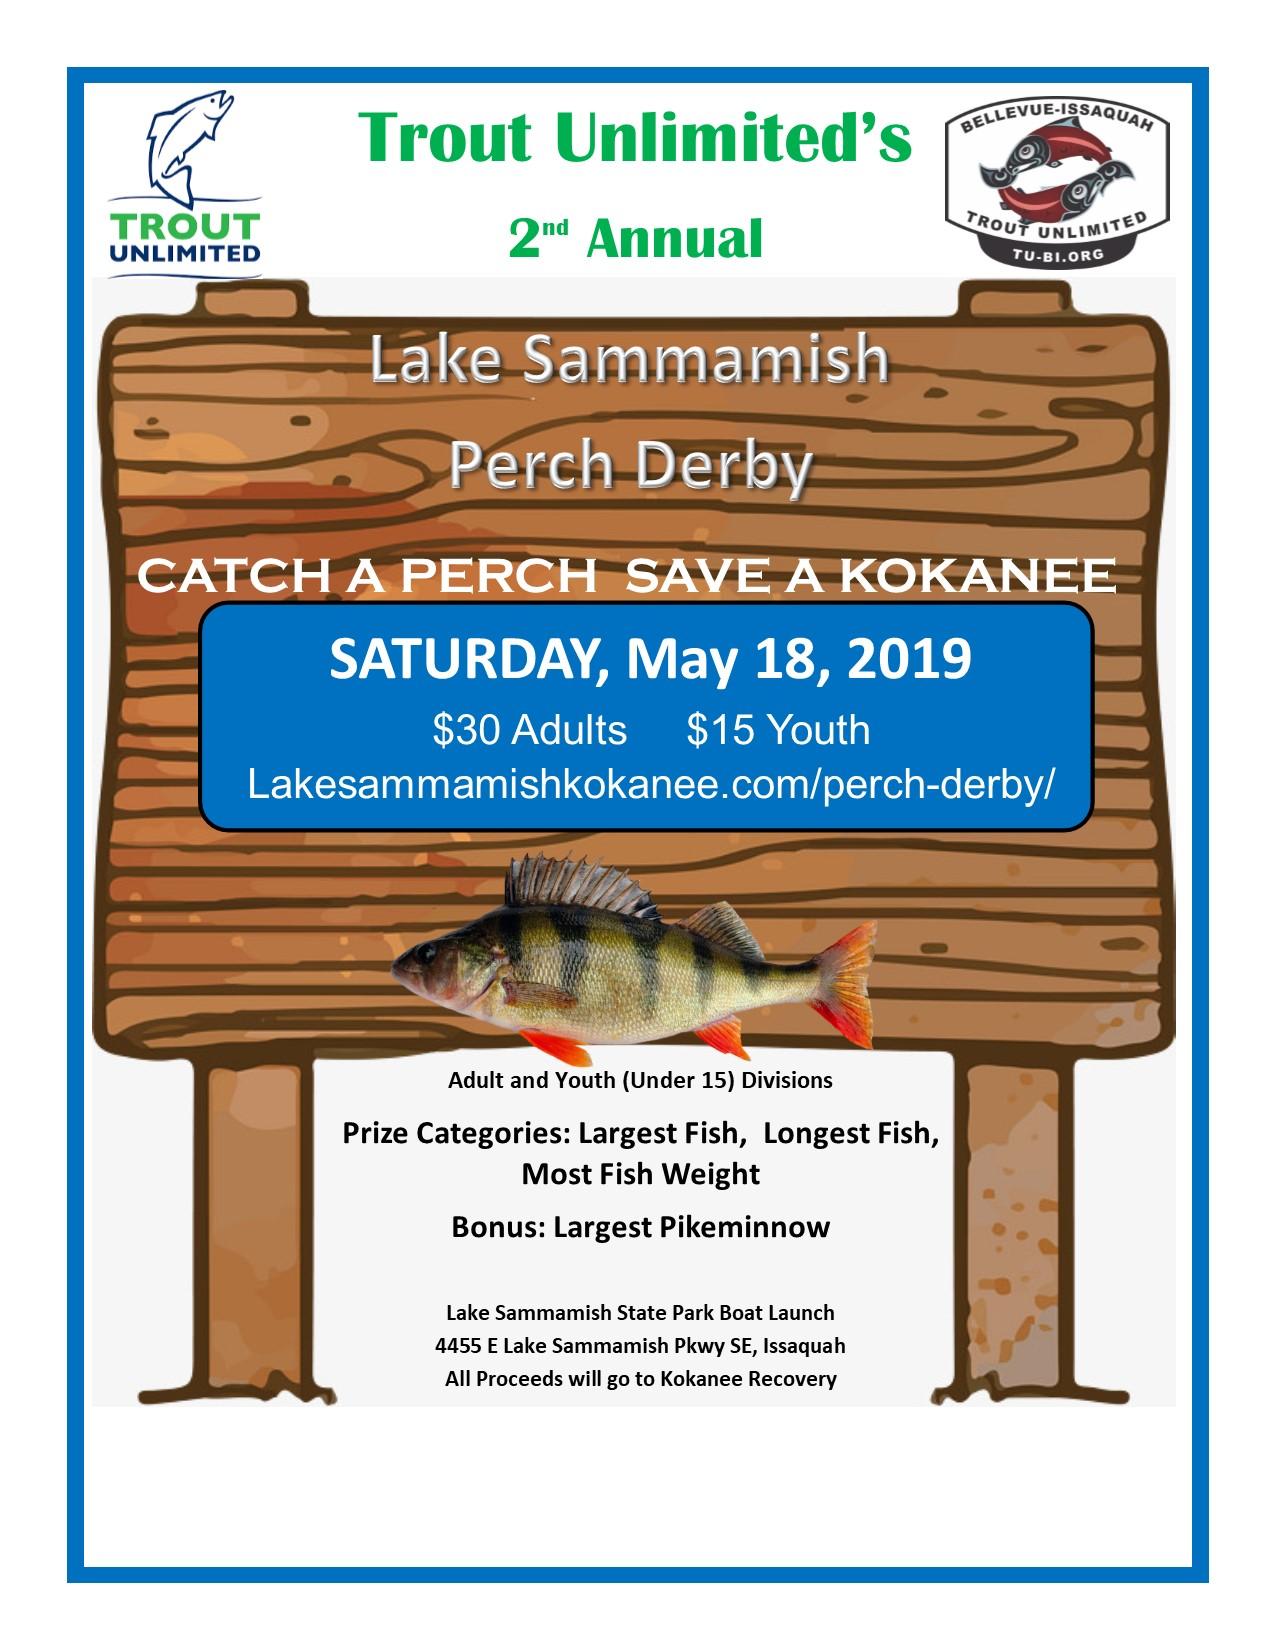 Perch Derby Lake Sammamish Kokanee